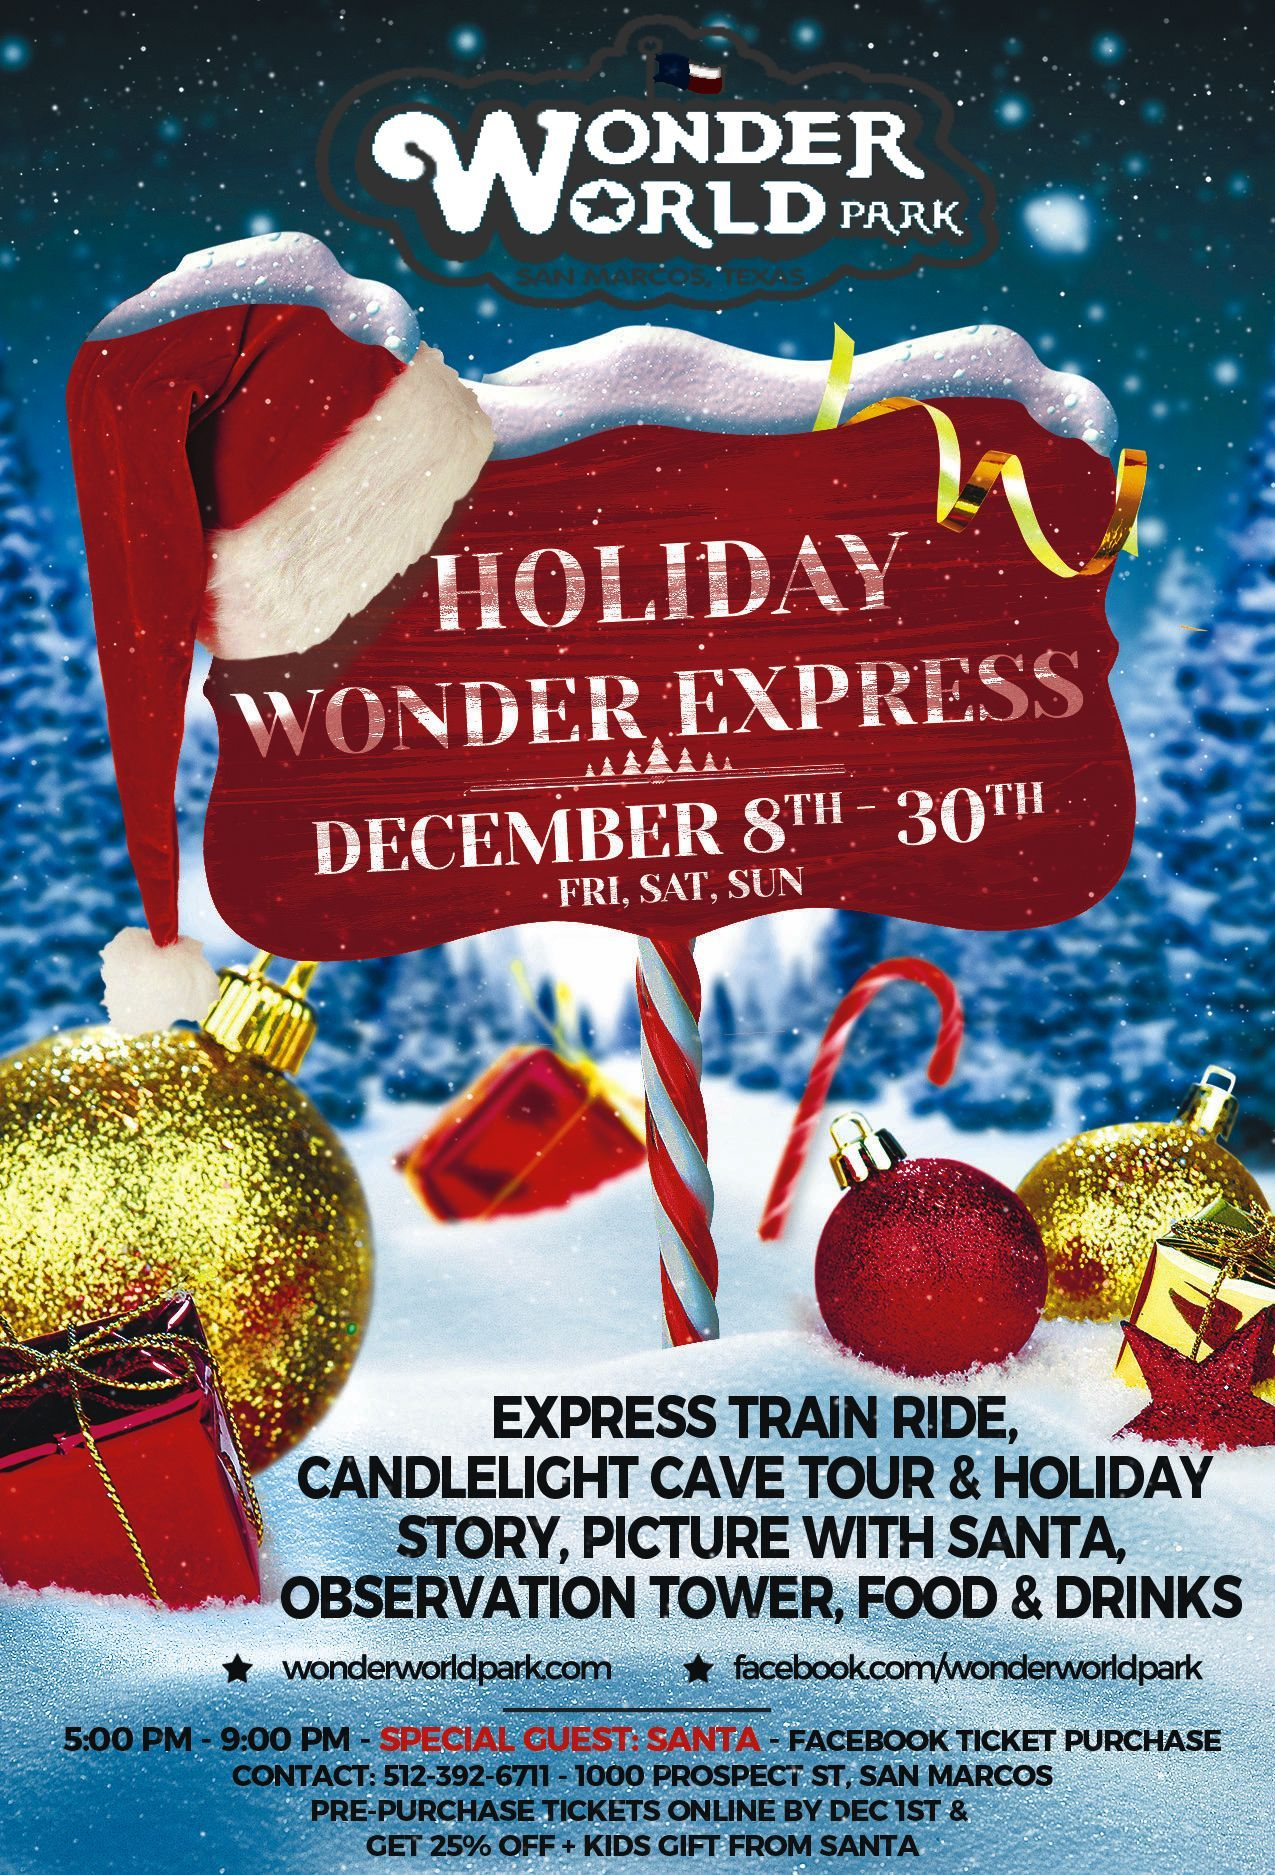 wonder world holiday event flyer 2017